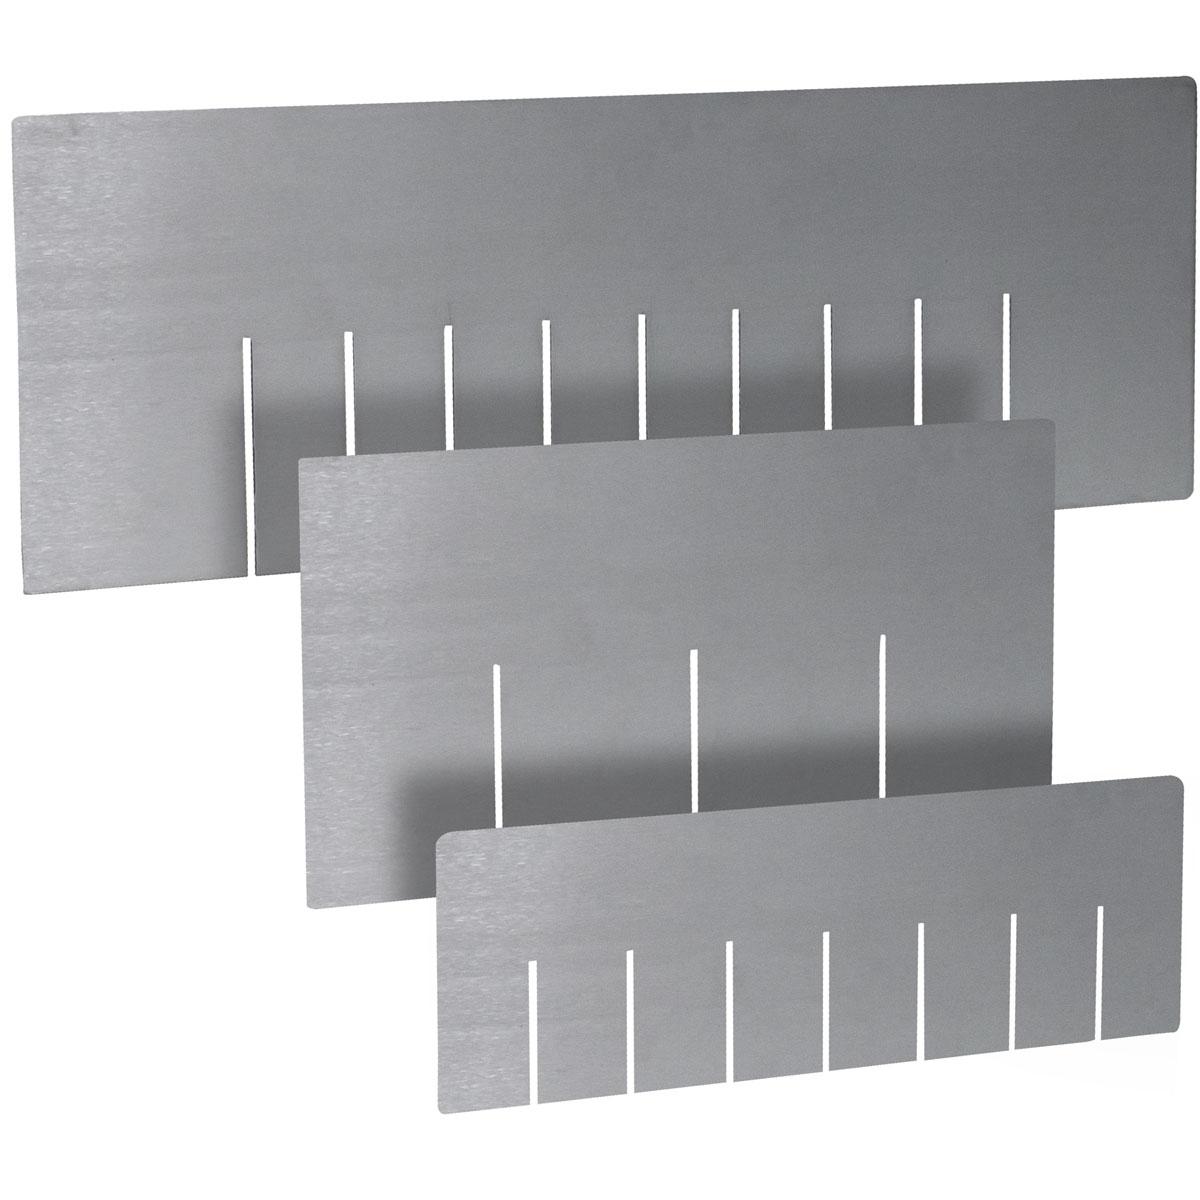 "Long Aluminum Divider20.65"" x 5.63""SKU: 521034"